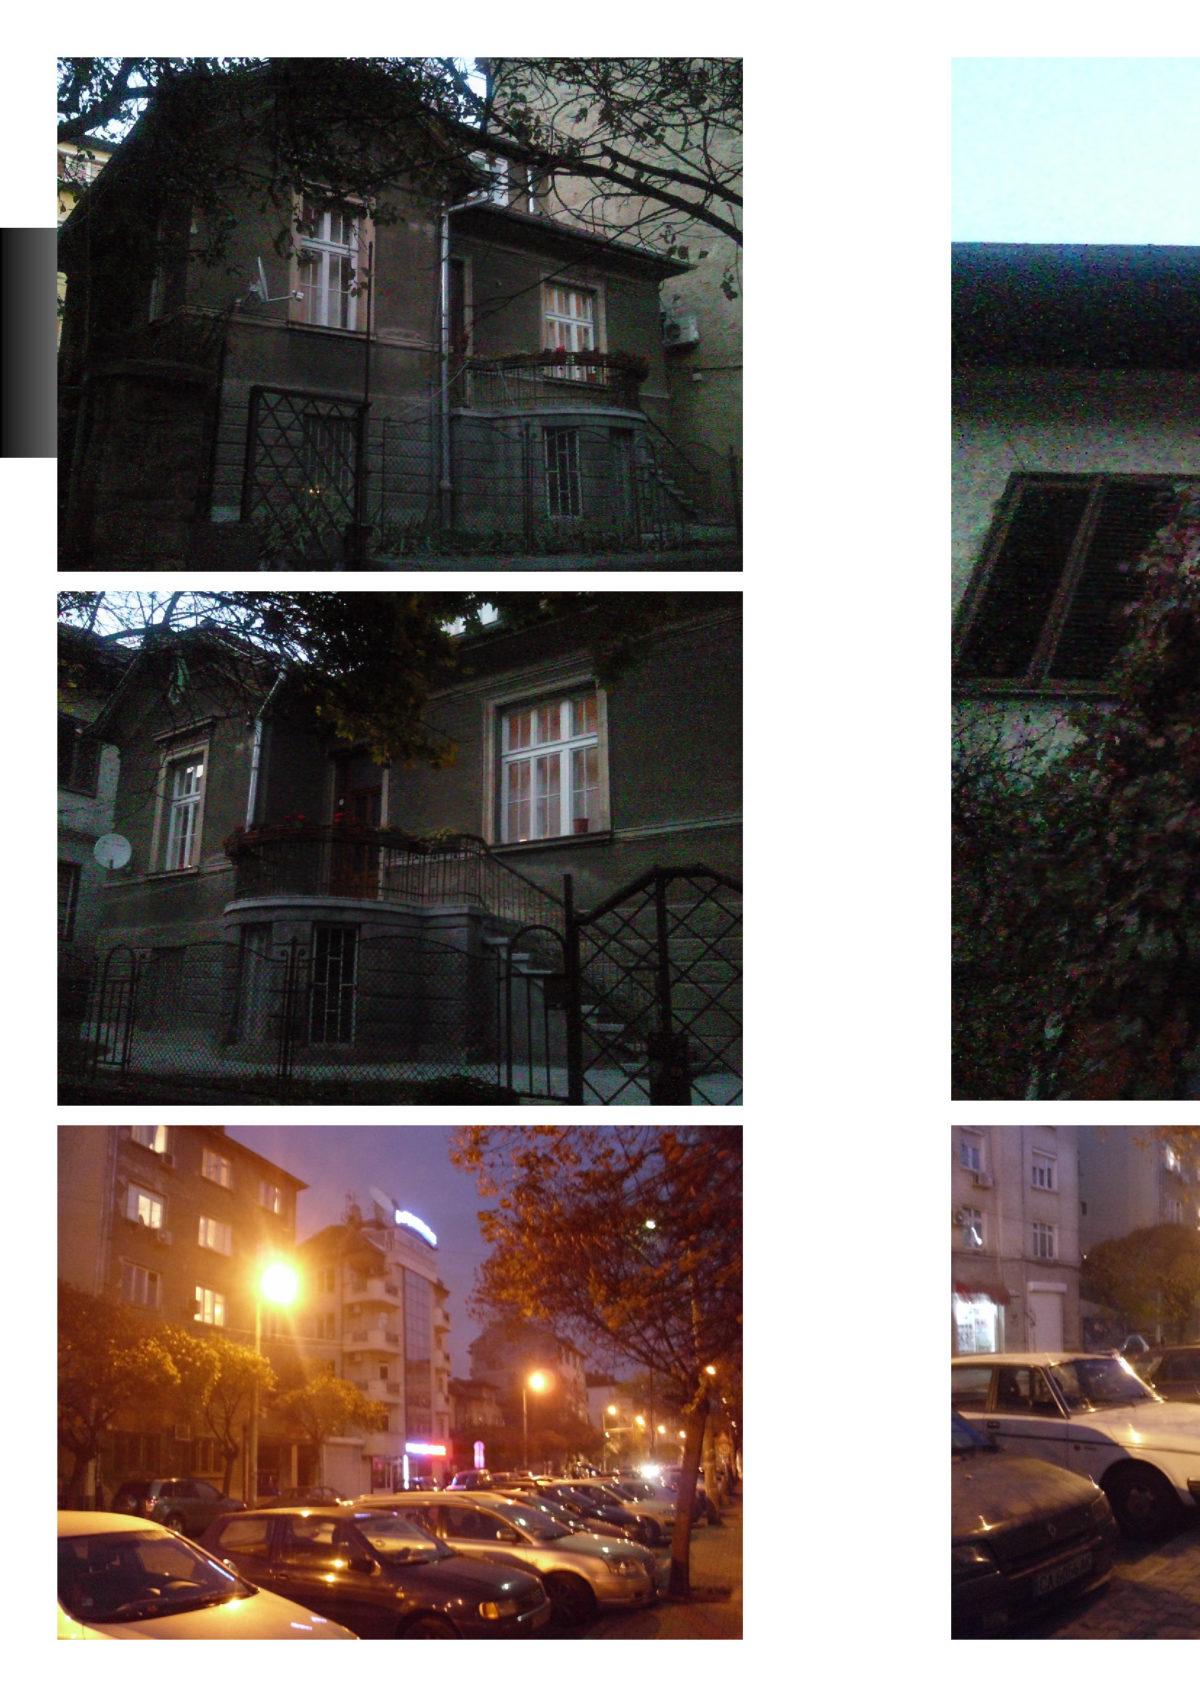 http://www.petkovstudio.com/bg/wp-content/uploads/2011/02/ivanasen_Page_14-1200x1697.jpg